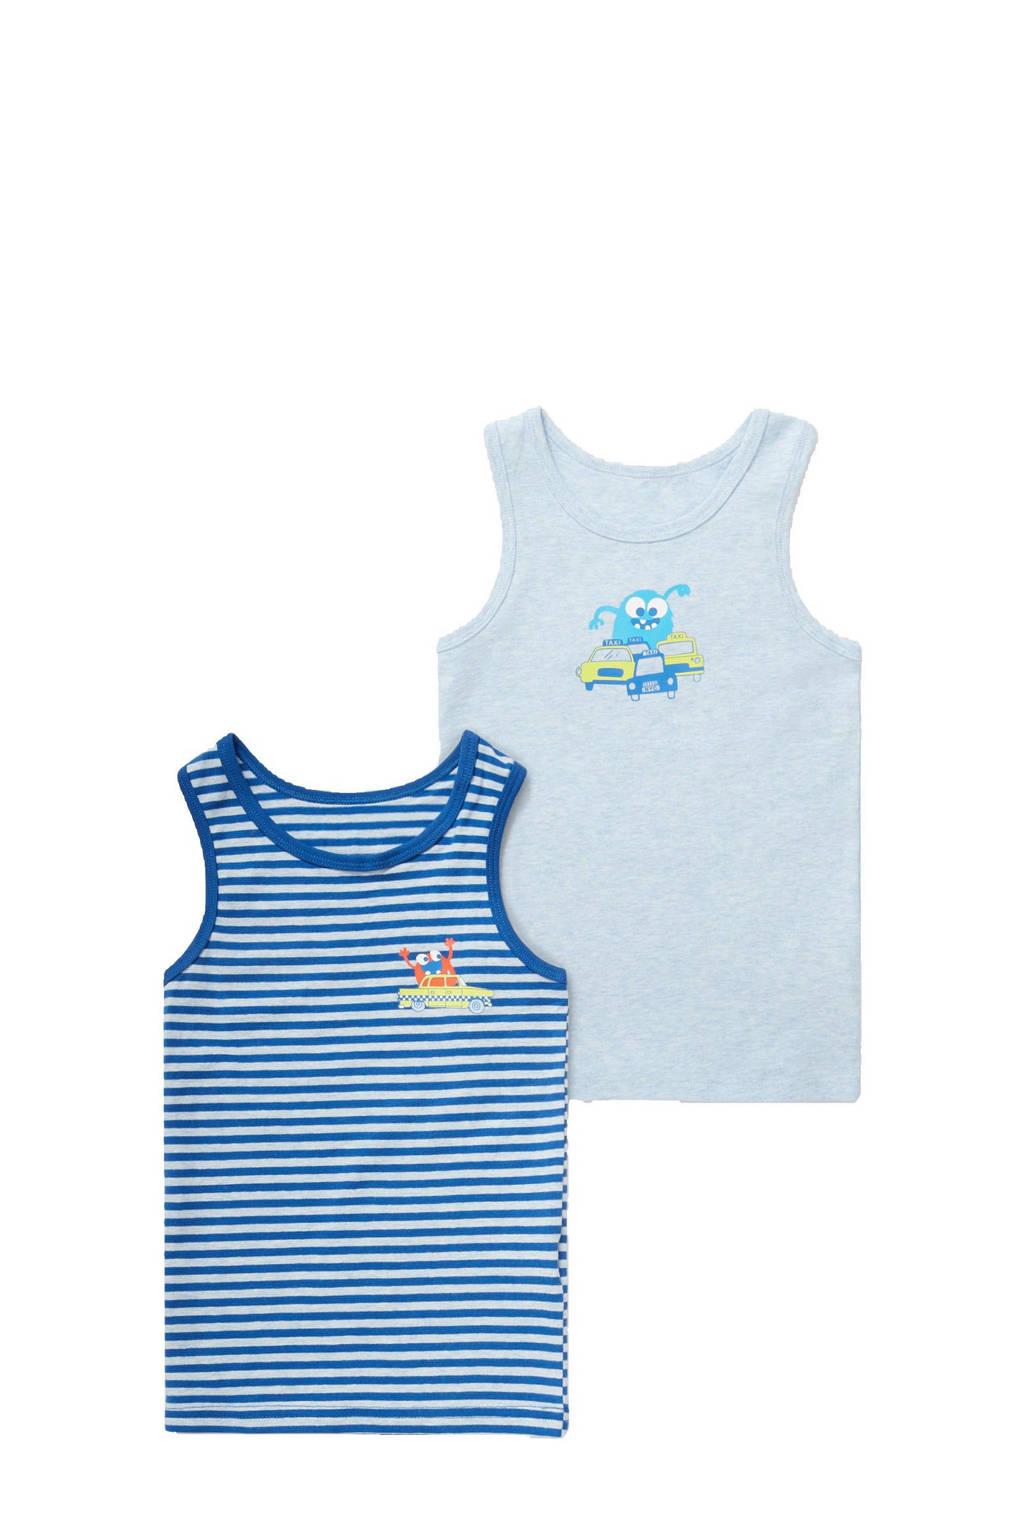 C&A Palomino hemd - set van 2 blauw/wit, Blauw/wit